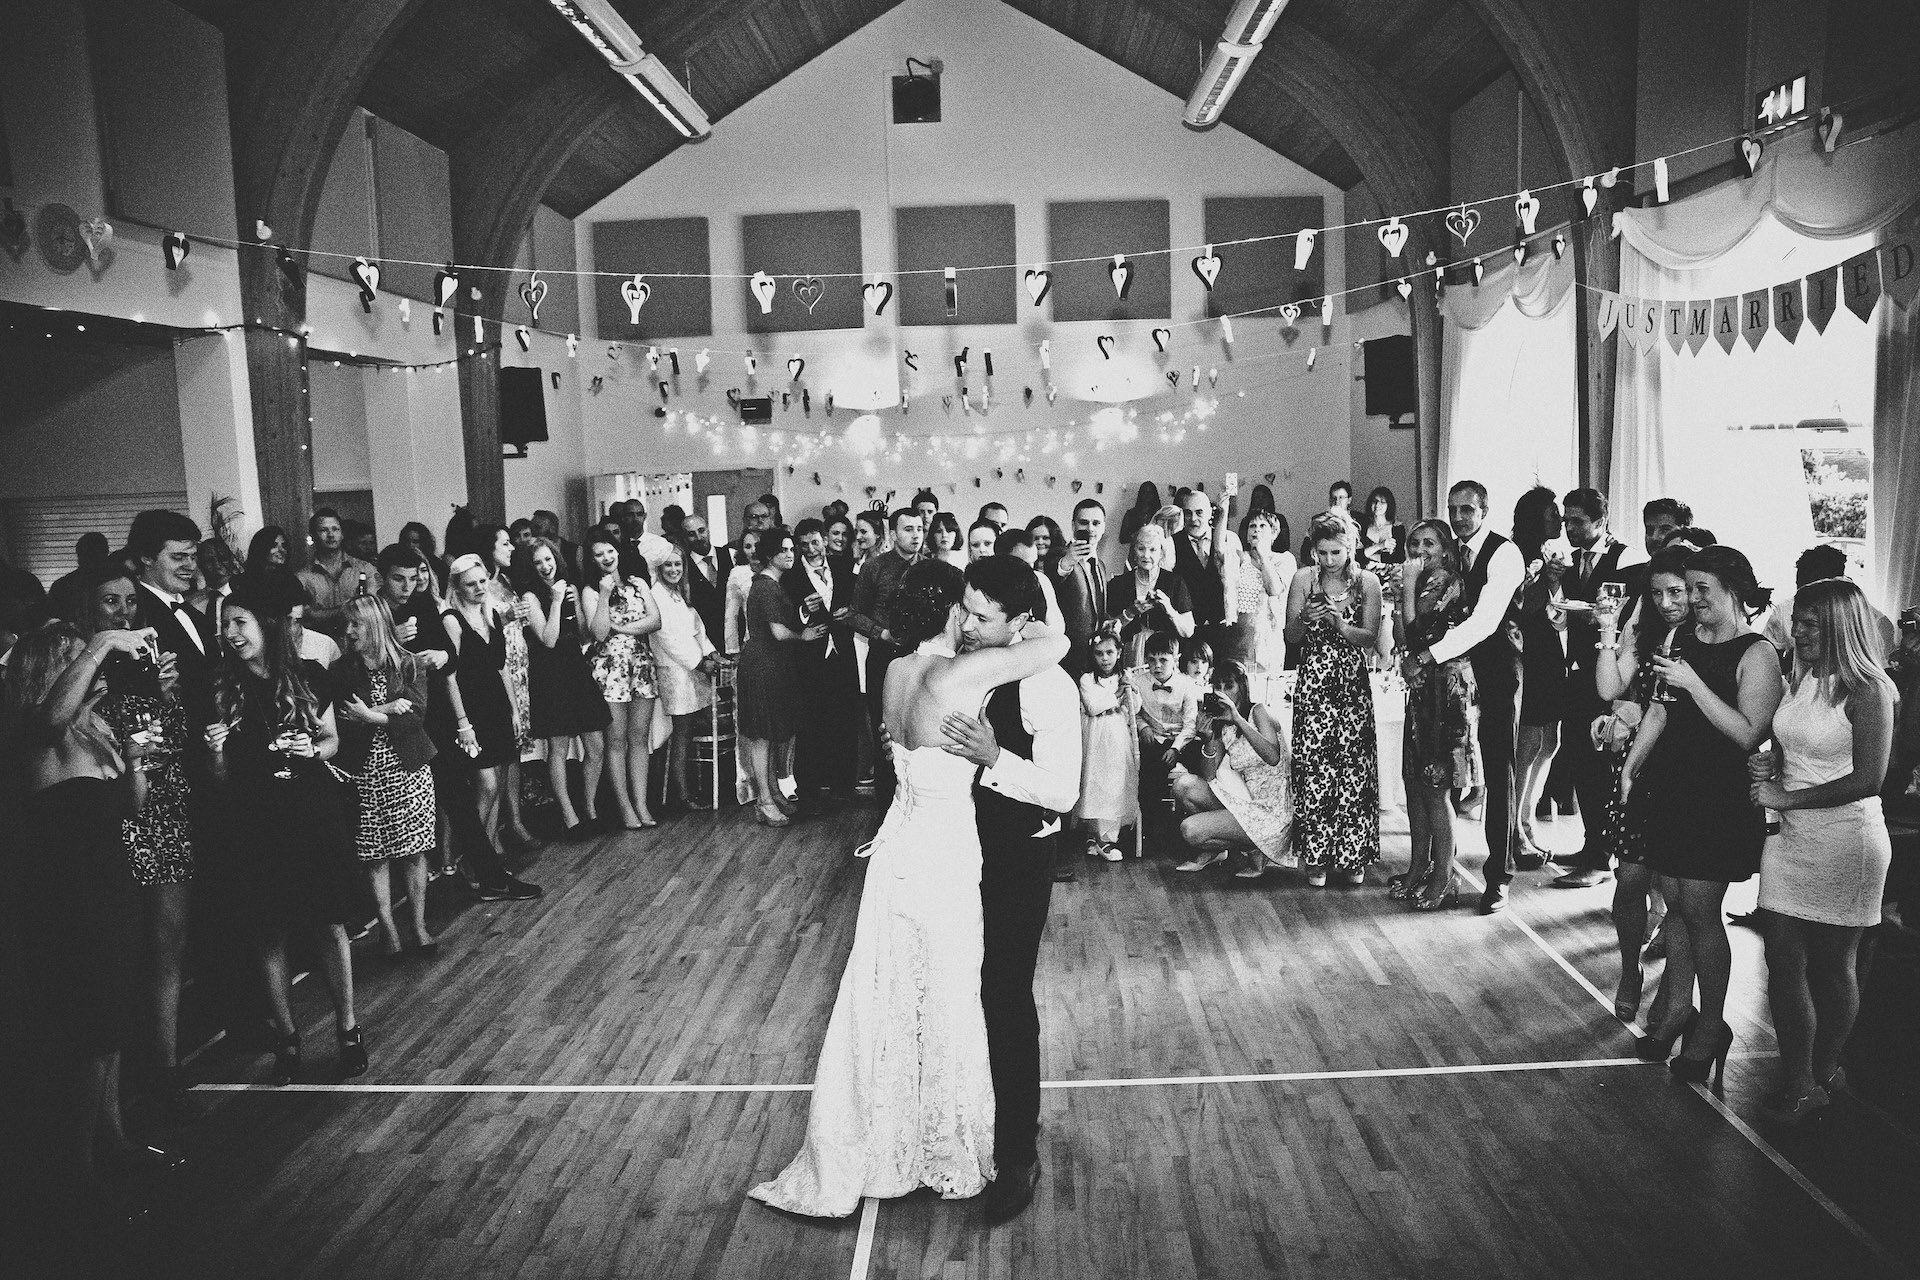 wedding reception venues north yorkshire%0A Danielle and Ian  First Dance  Wedding  Photography  Kettlesing Millennium  Hall  Harrogate    North YorkshireMy